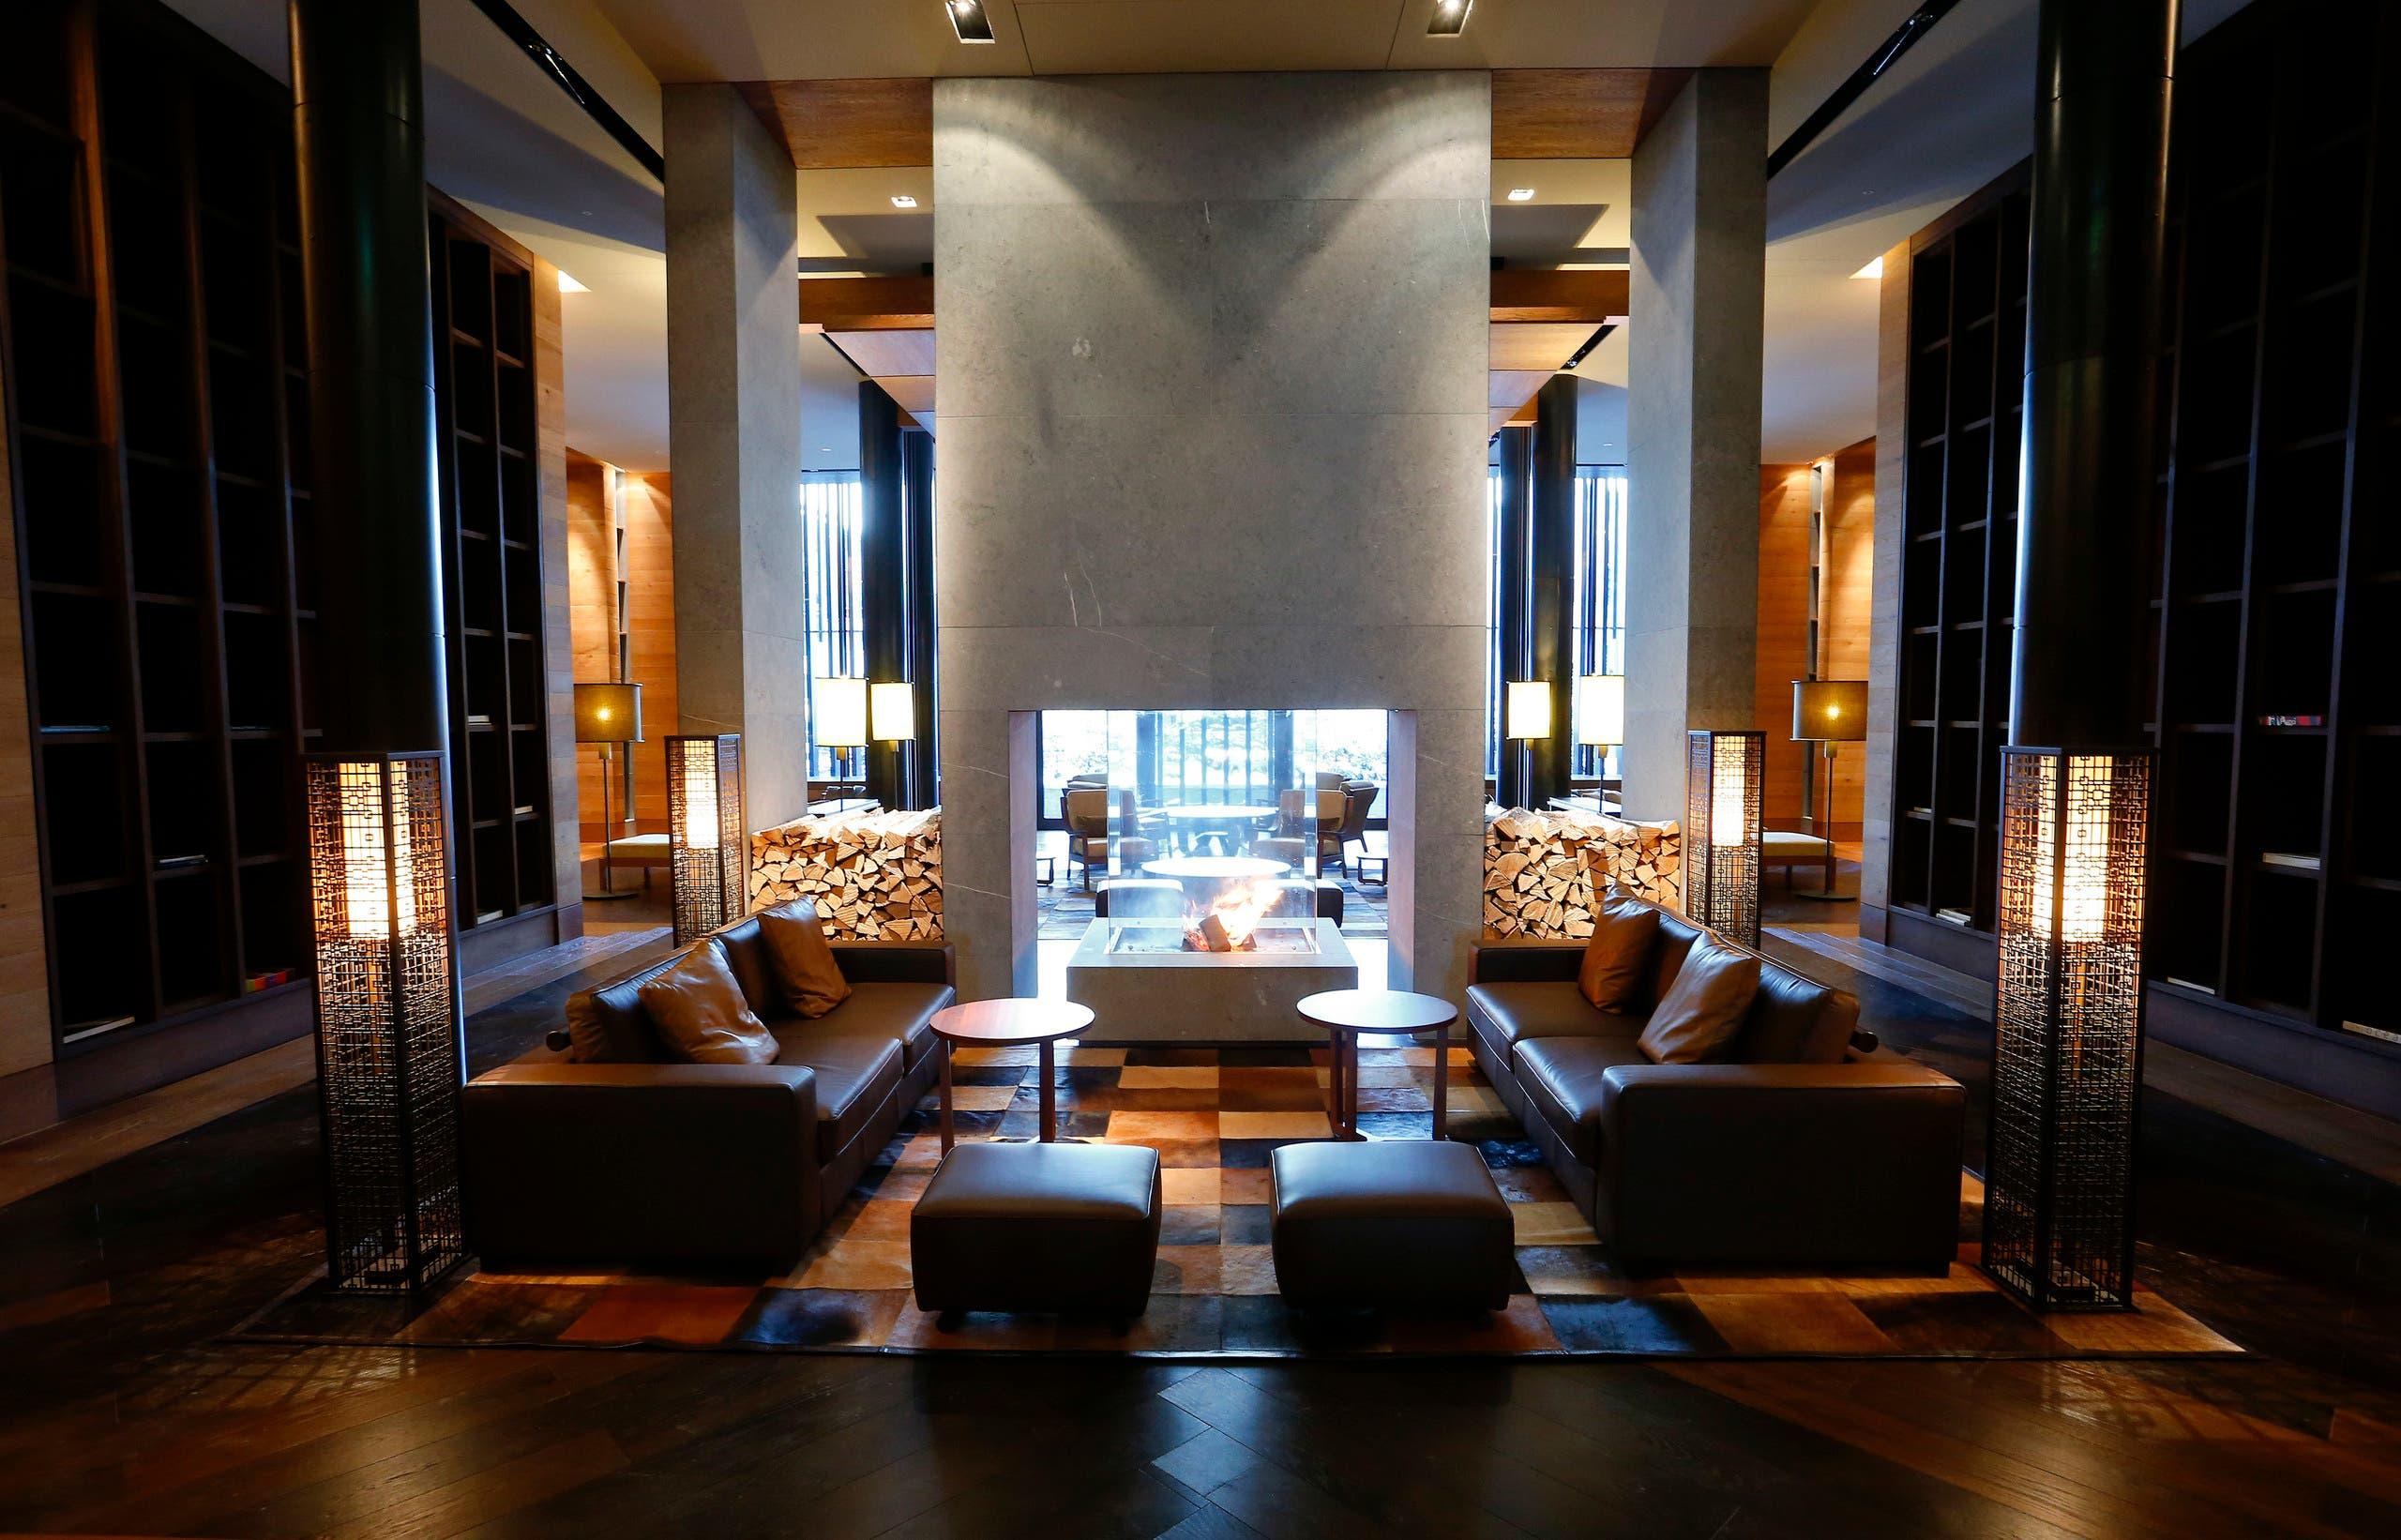 فندق Chedi Andermatt